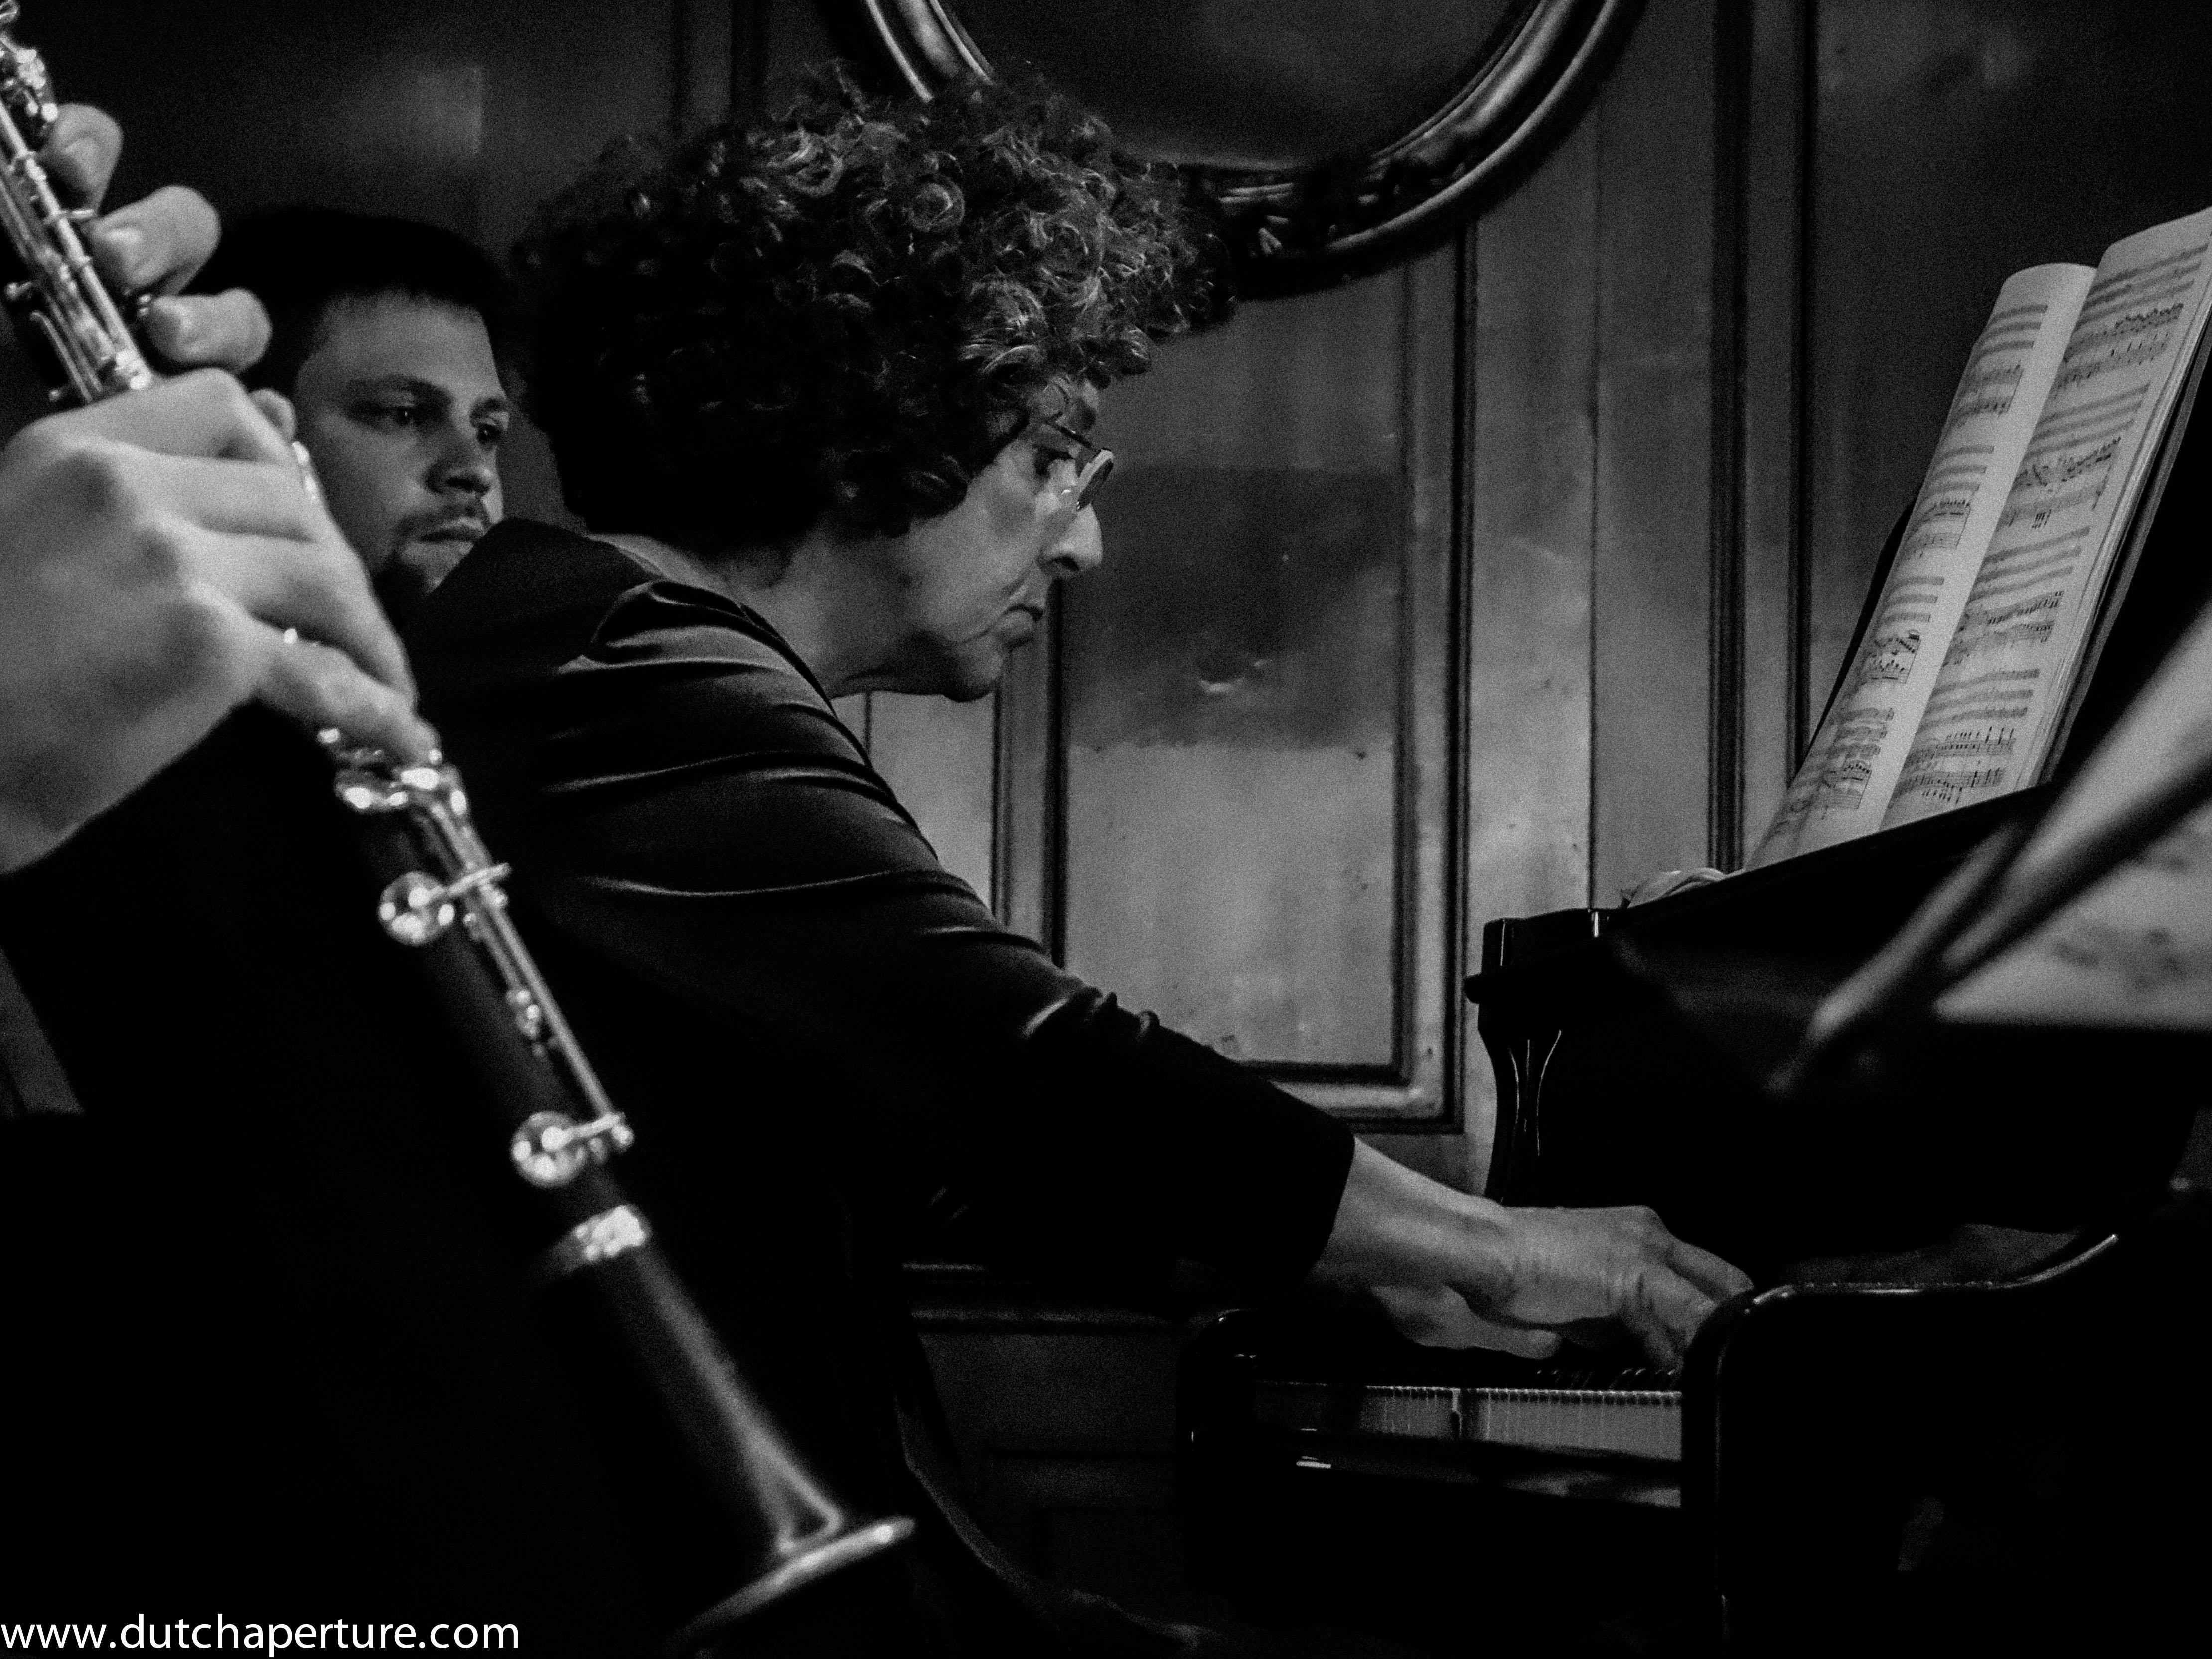 Bilder Concert Ayadin - Hopkins Marti - Hänni WP MP-9